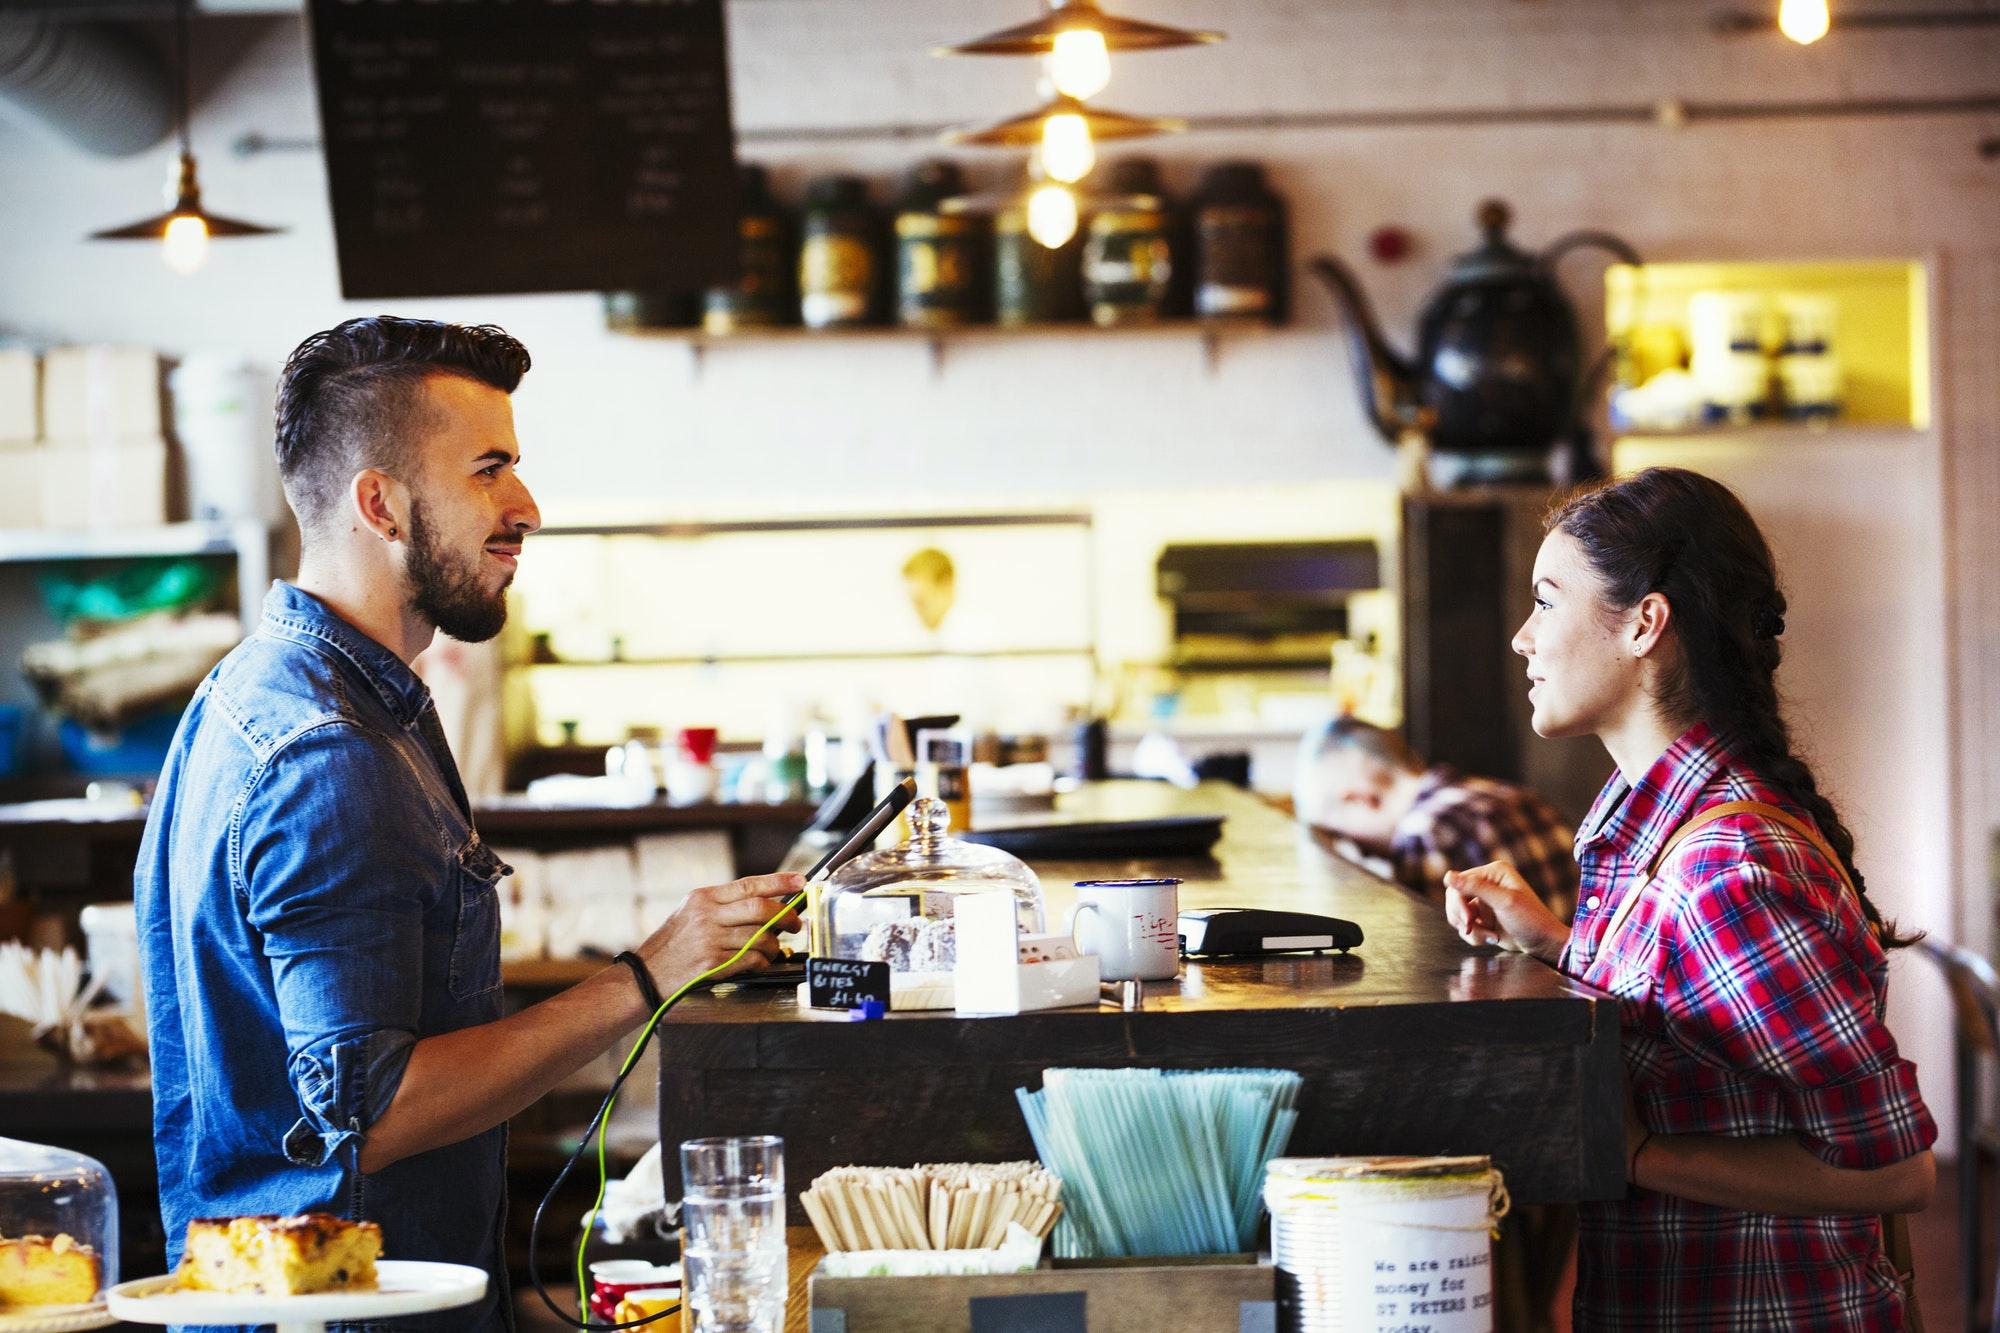 Barista and customer in coffee shop